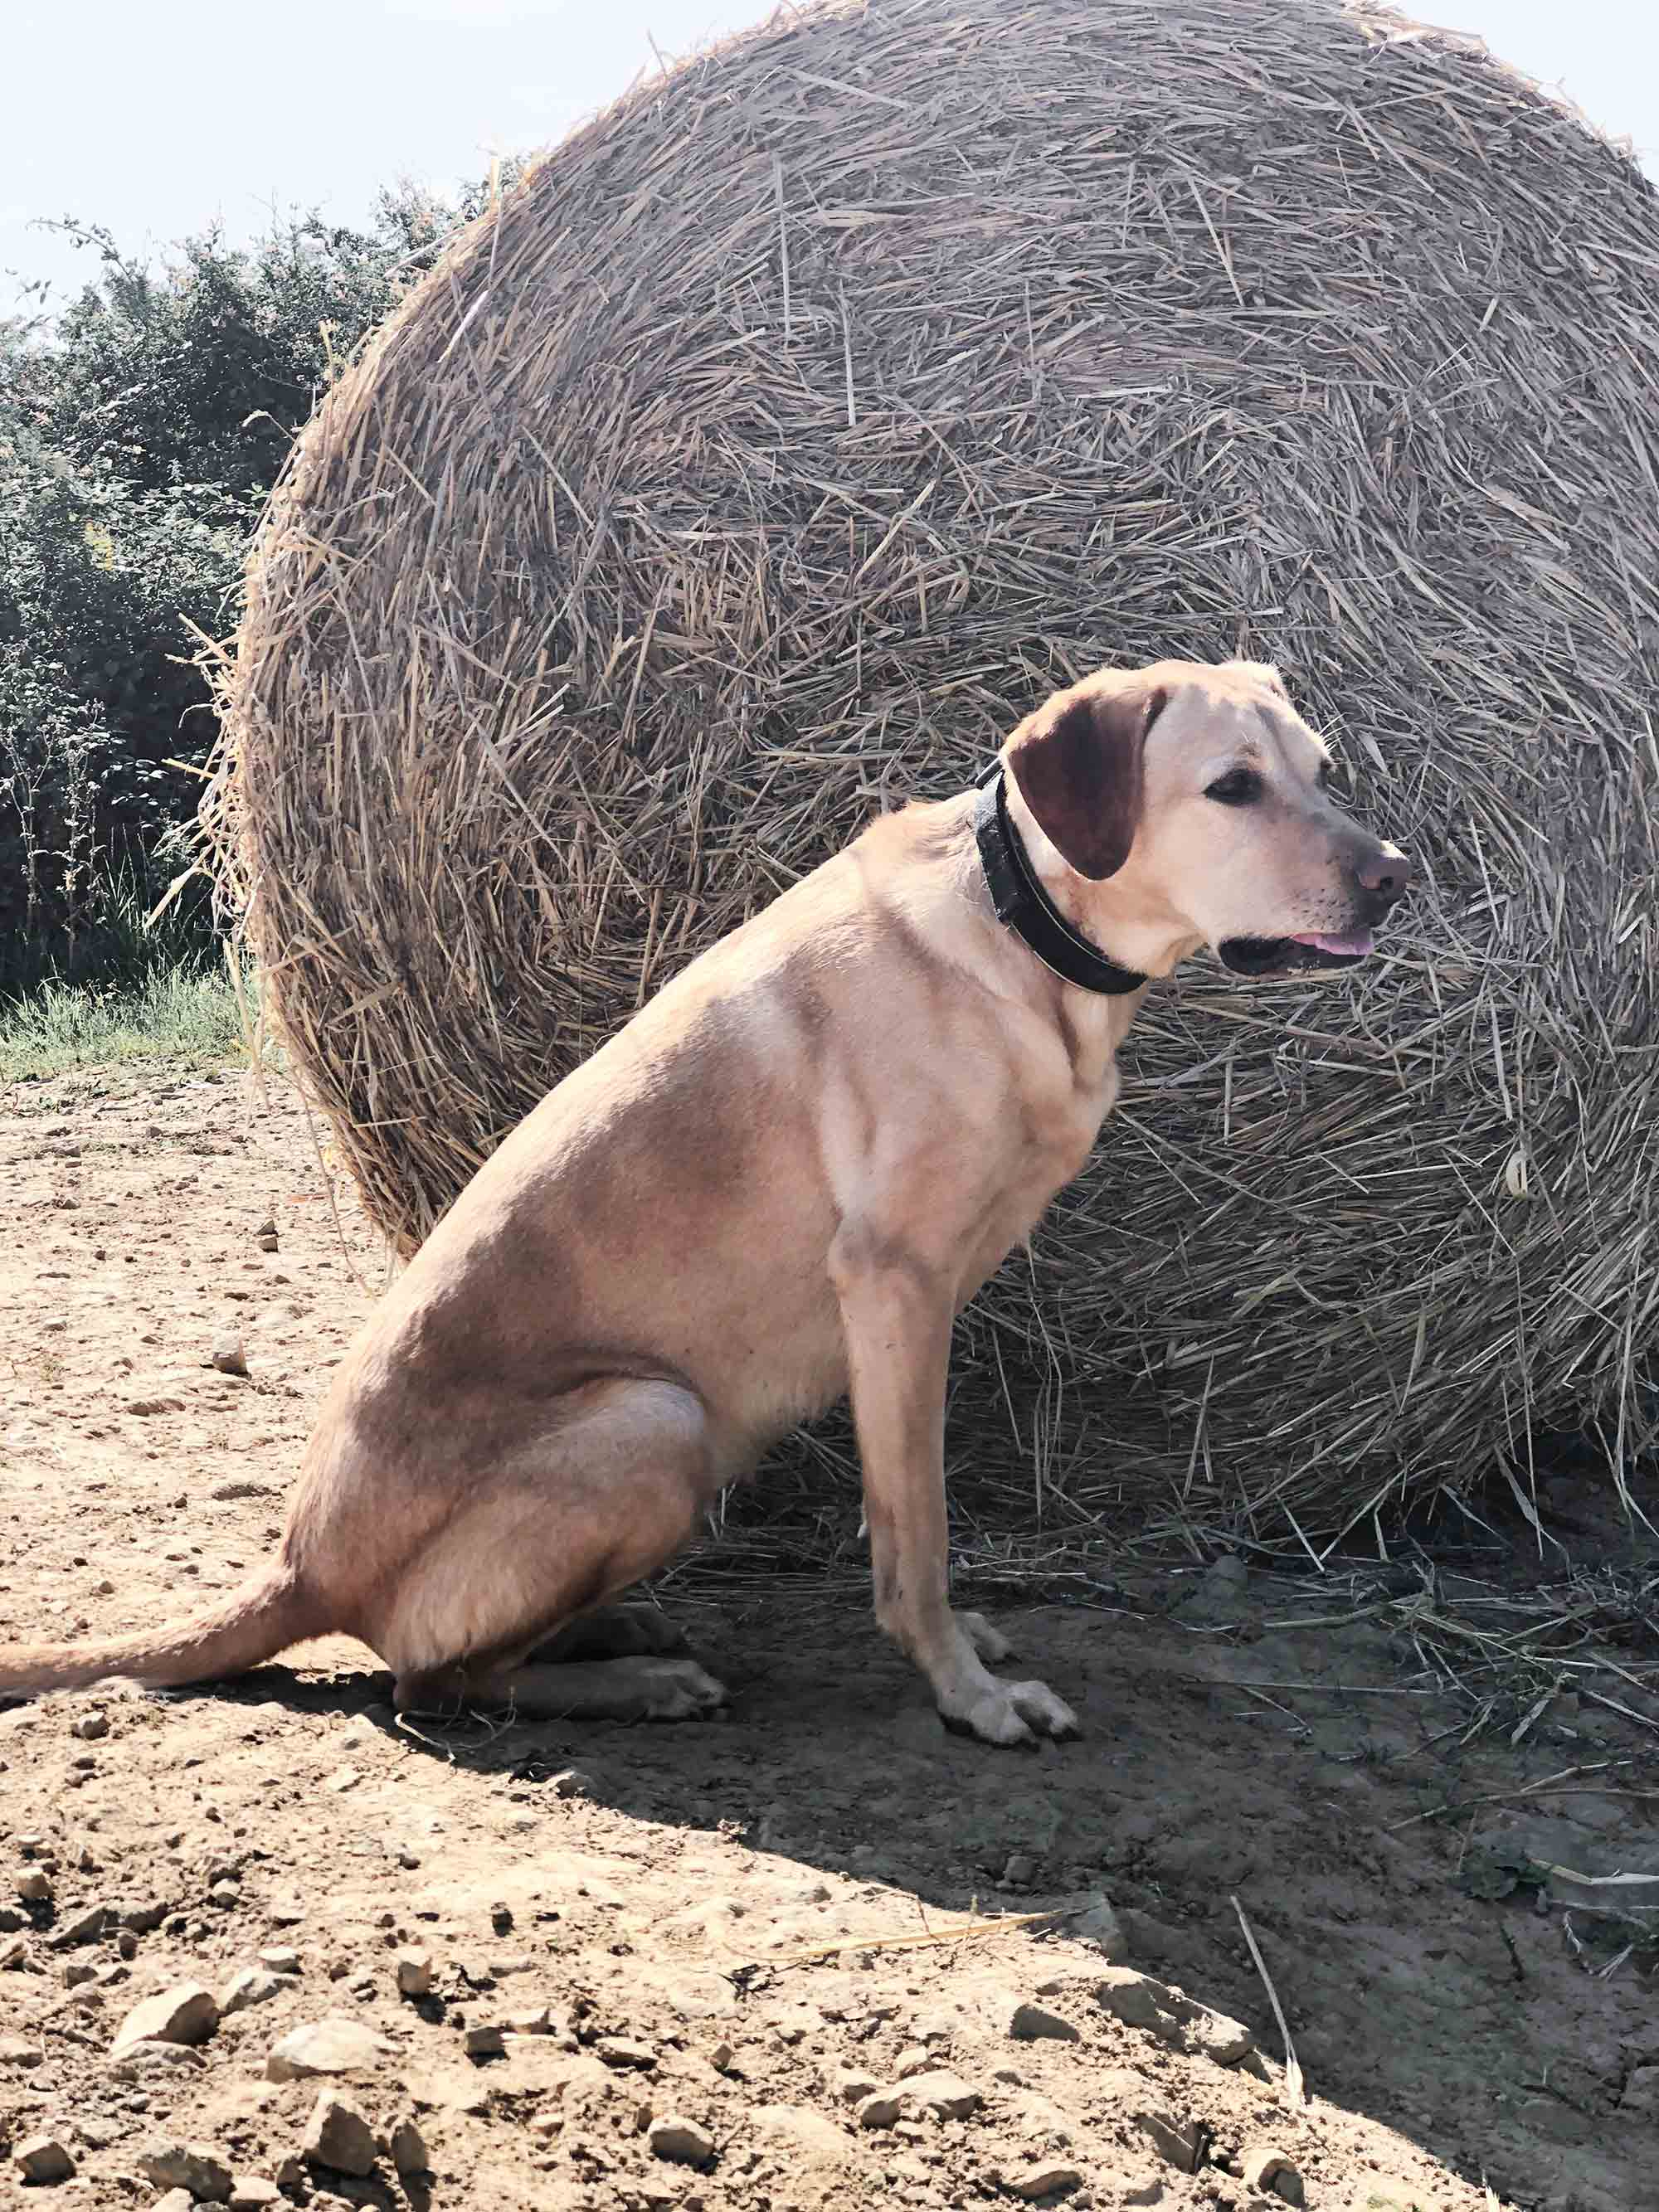 7 SBS labrador-in-front-of-hay-bale.jpg